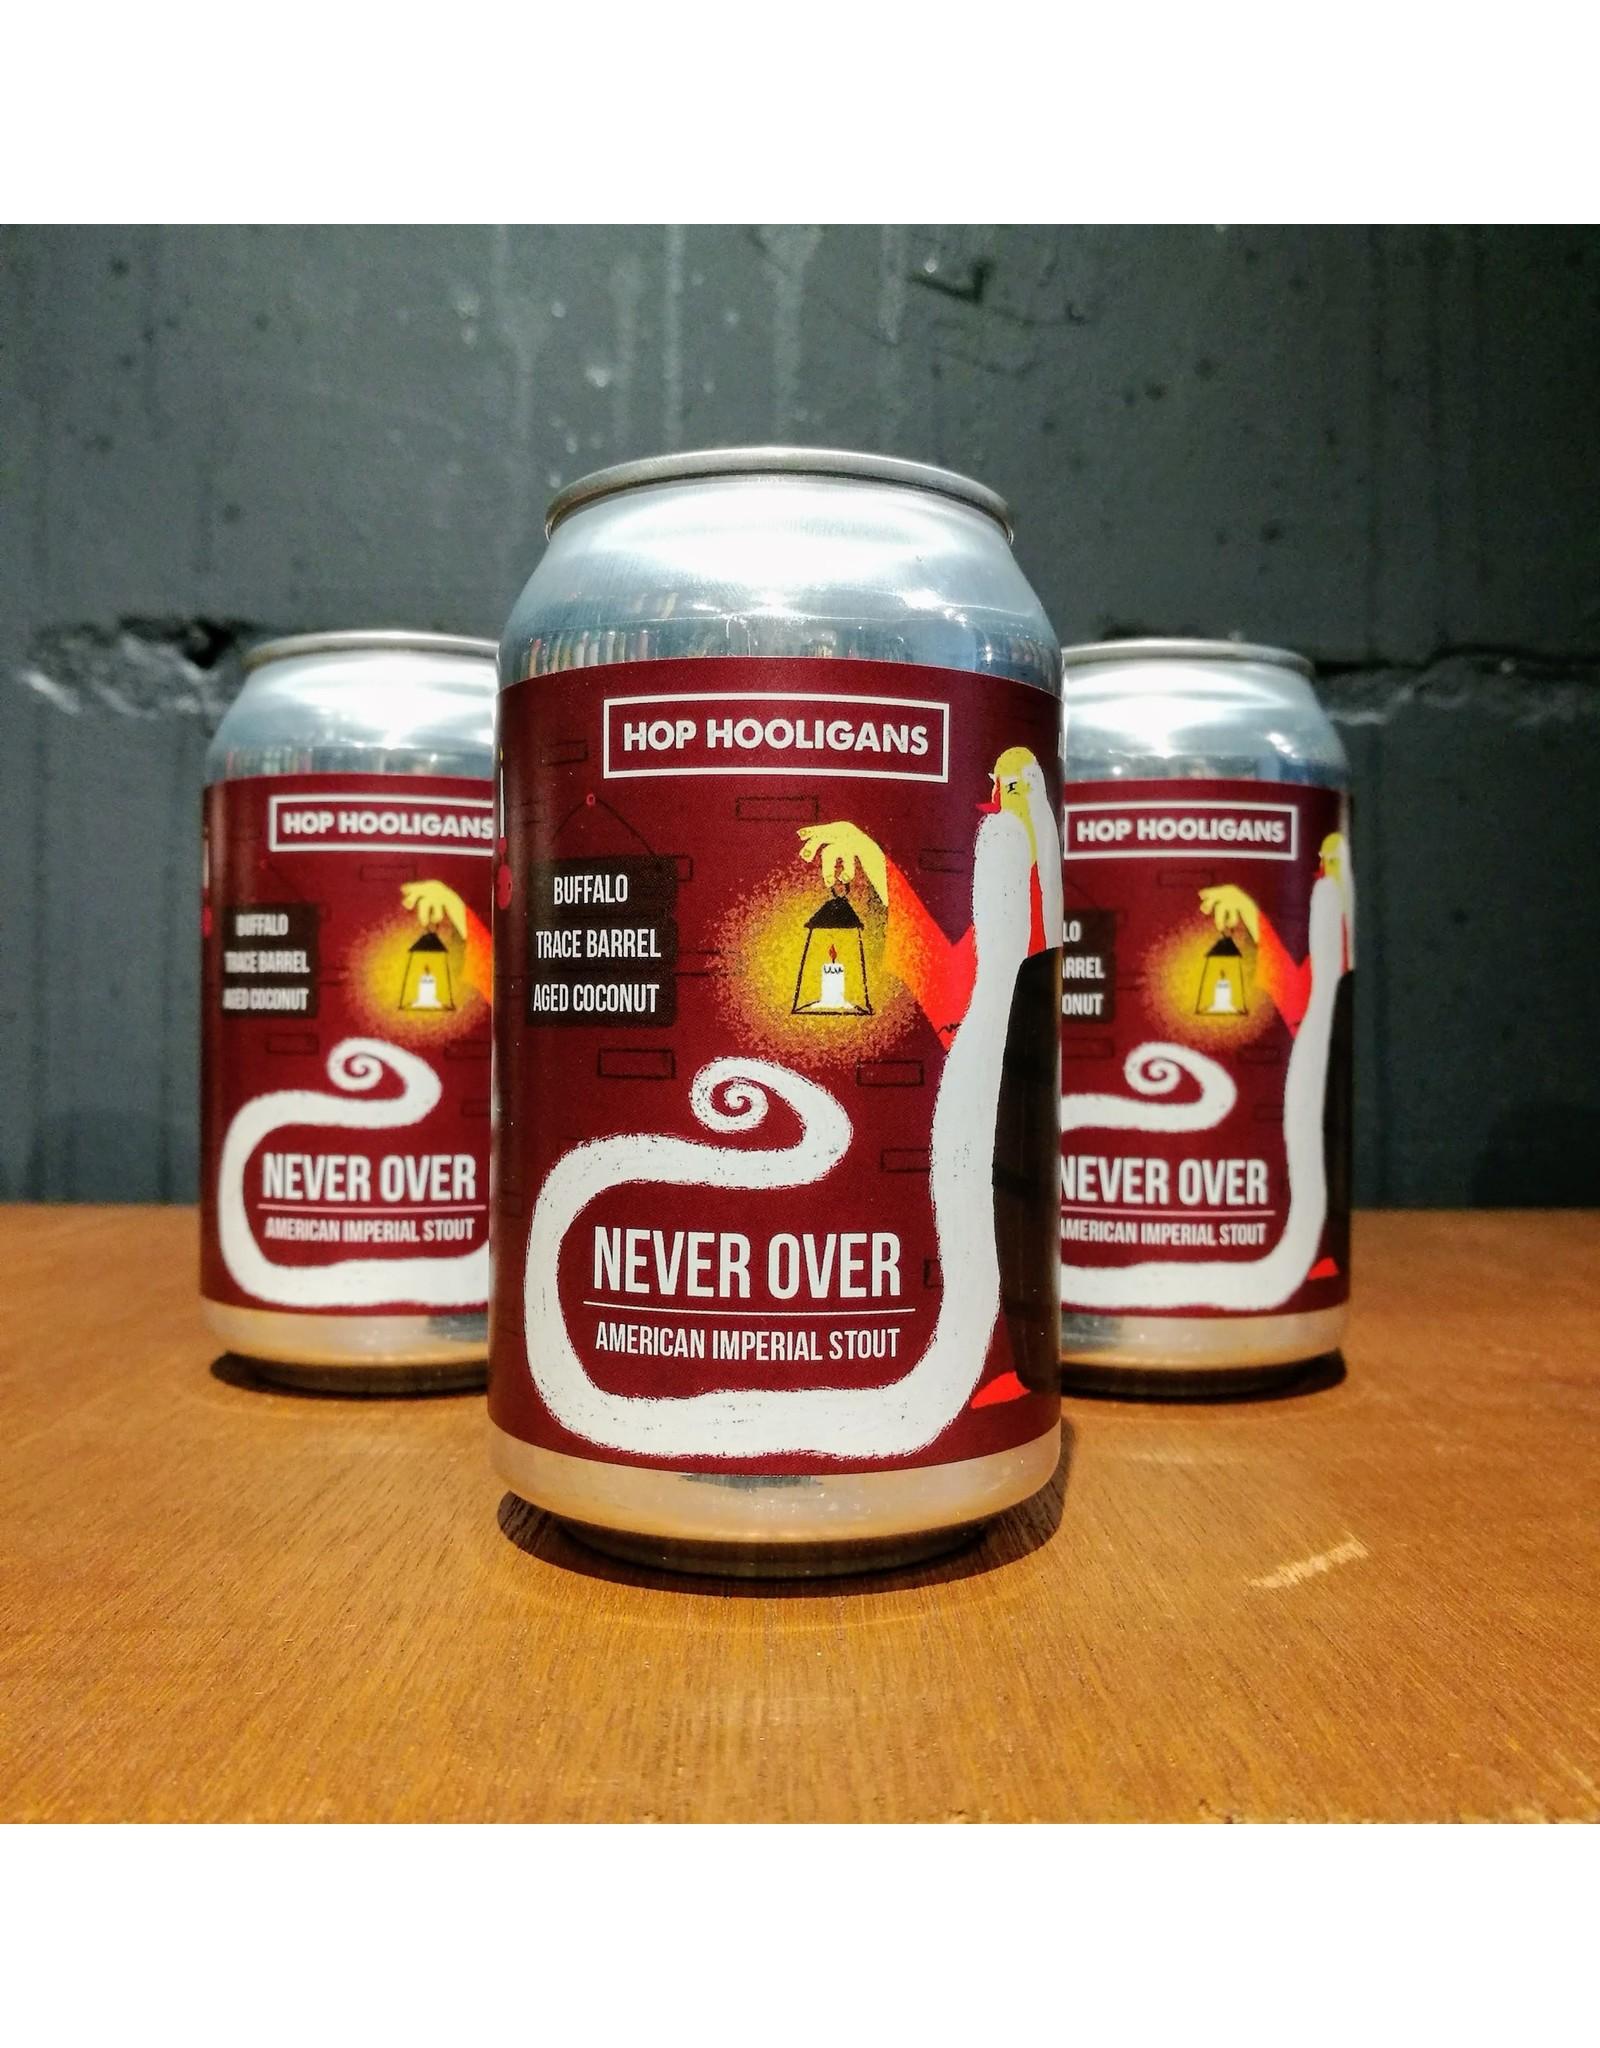 hop hooligans Hop Hooligans - Never over Buffalo trace Coconut